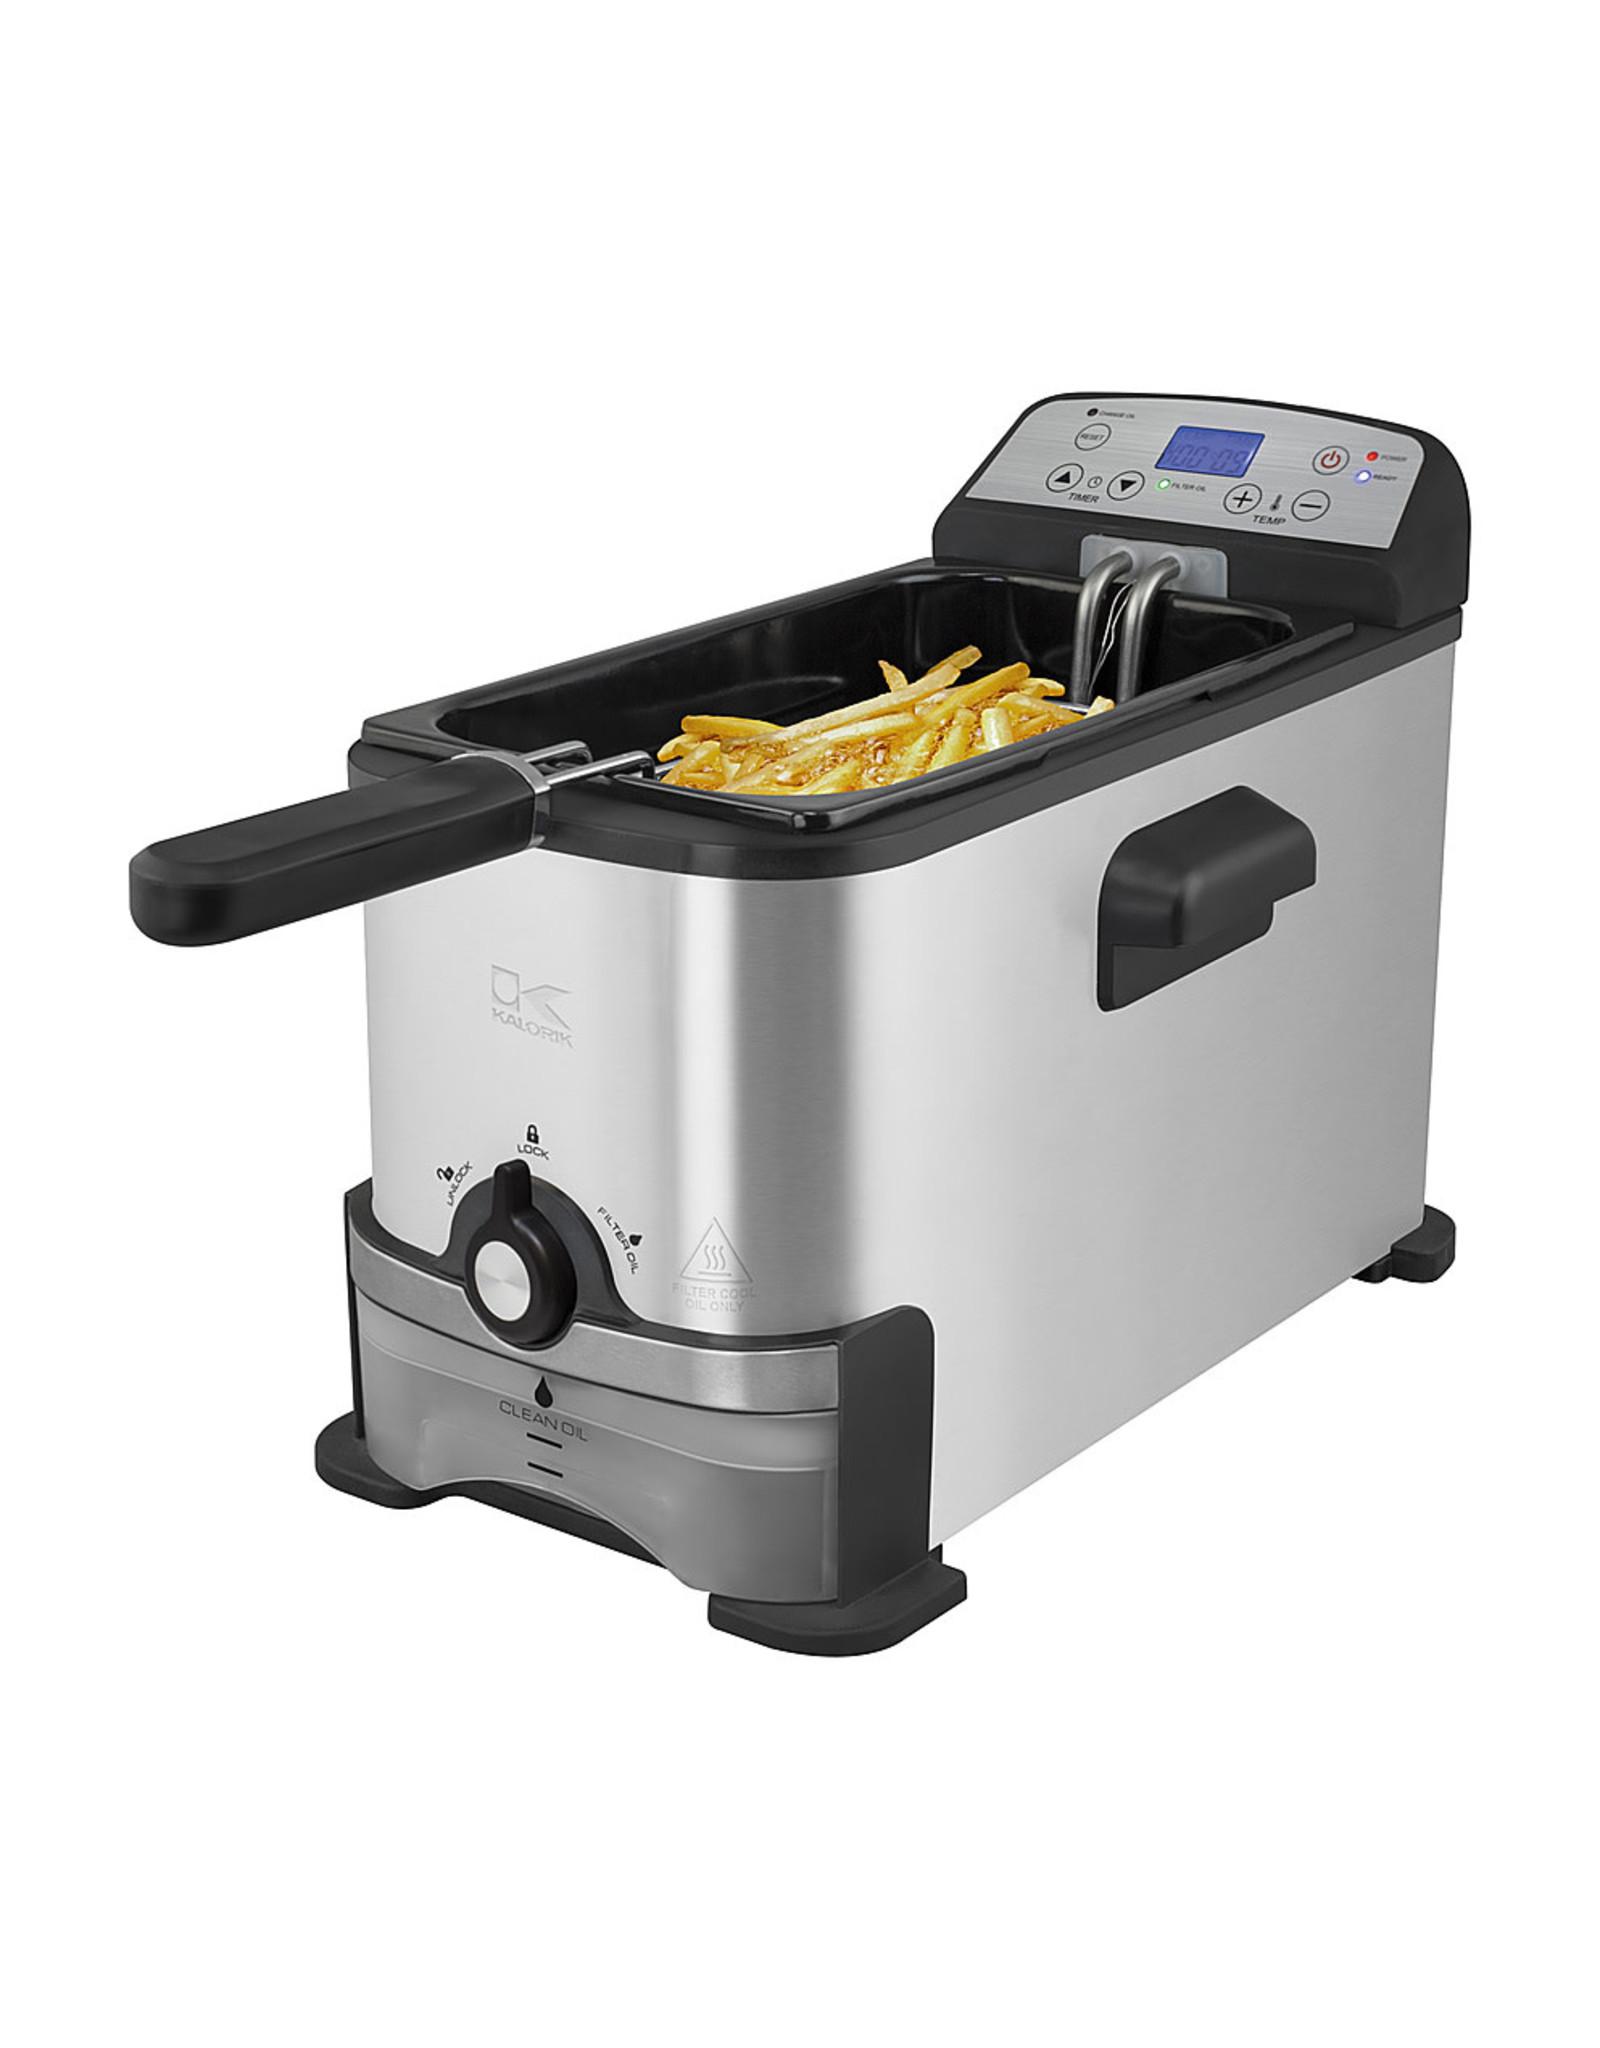 KALORIK FT 44247 BK Kalorik - 3.2qt Digital Deep Fryer - Stainless steel